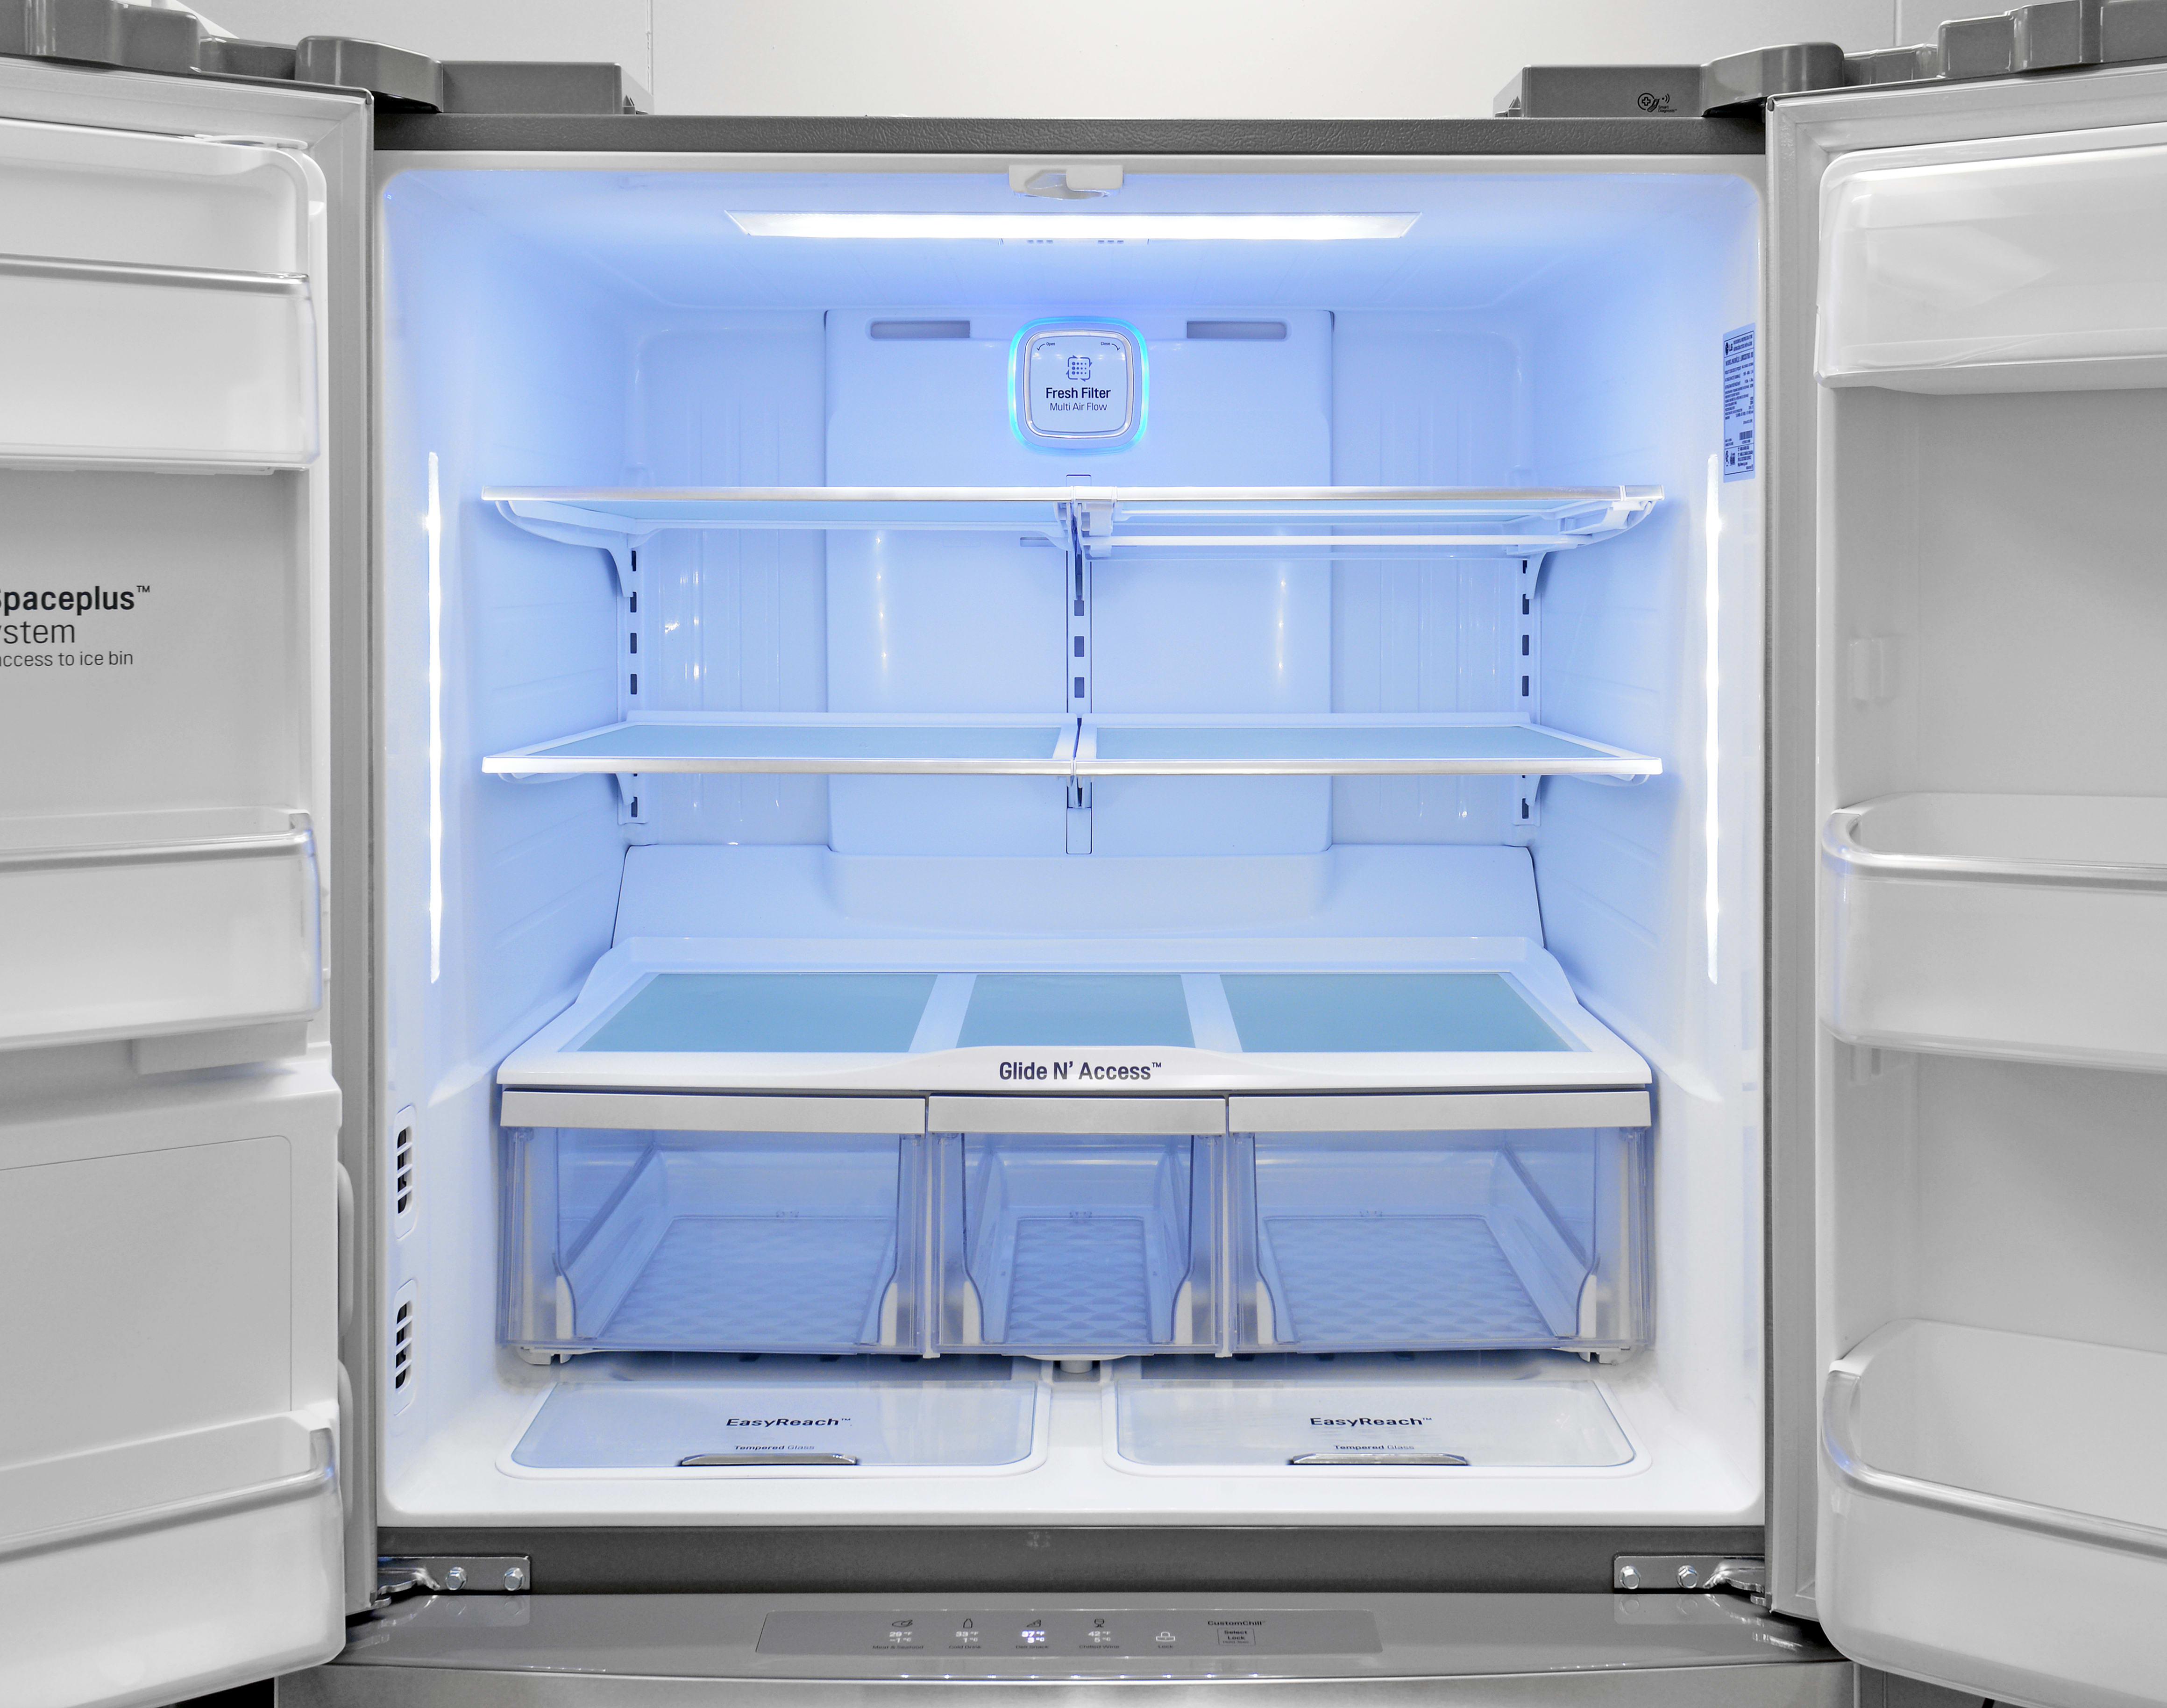 Bright lights, big fridges—you get plenty of well-lit fresh food storage space in the LG LMXS30786S.